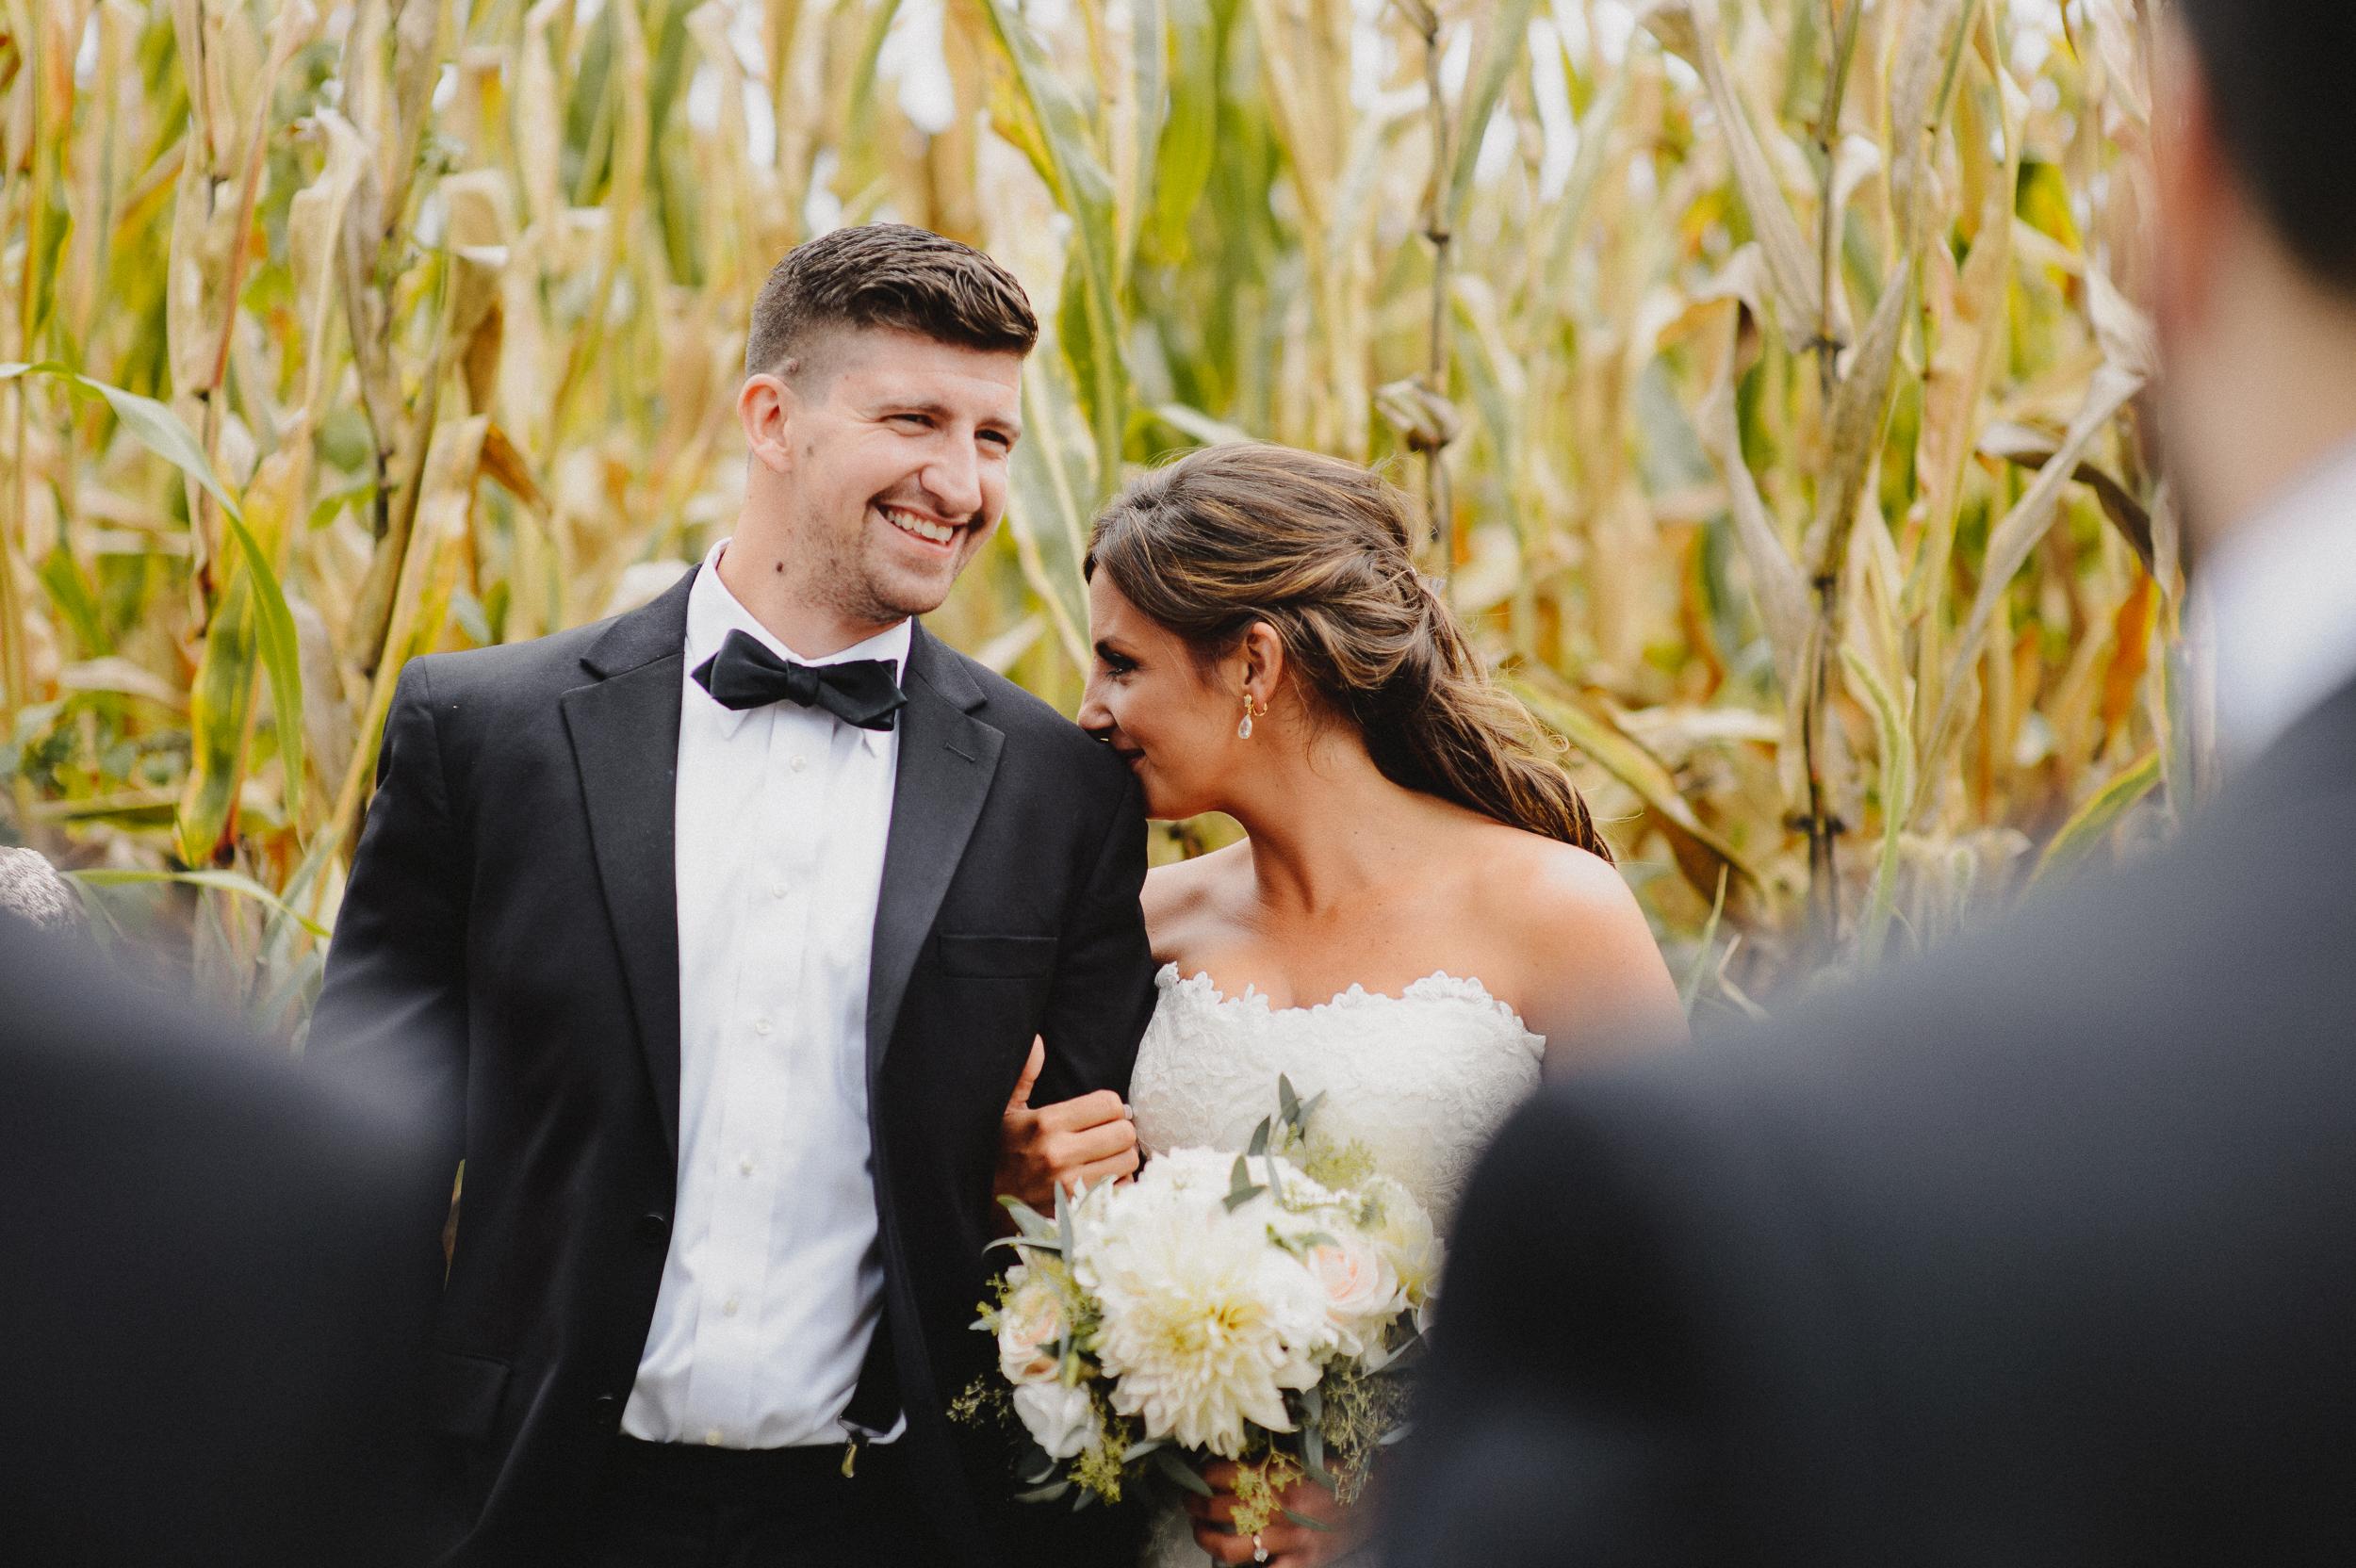 delaware-estate-wedding-photographer-pat-robinson-photography-48.jpg